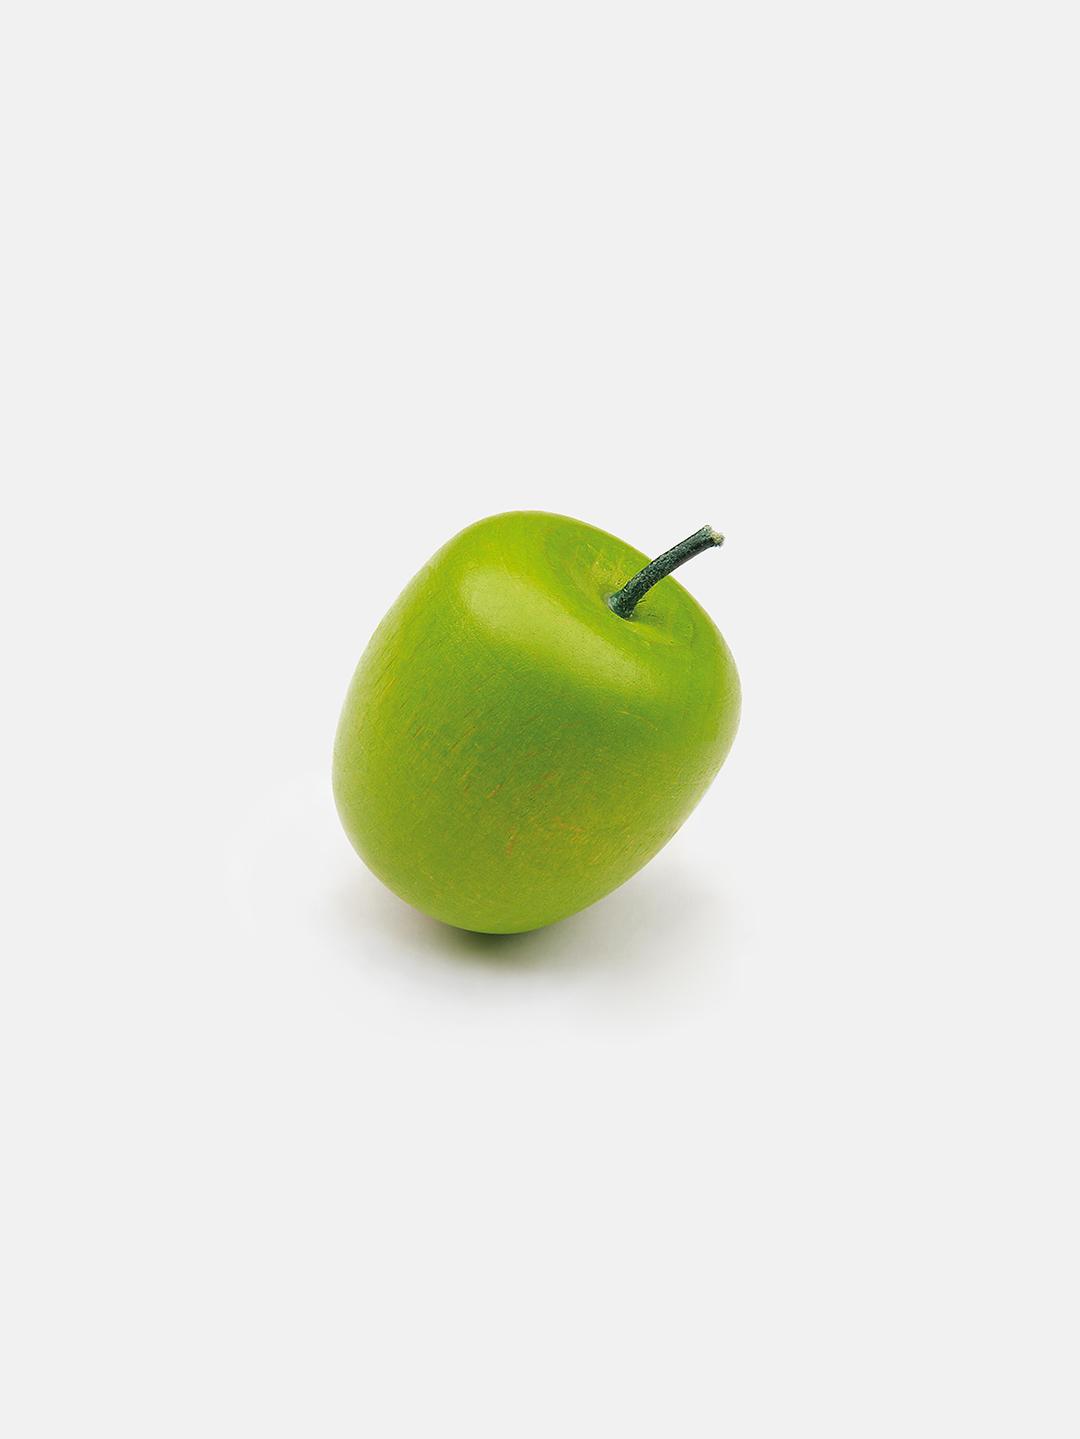 Wooden Fruit - Green Apple